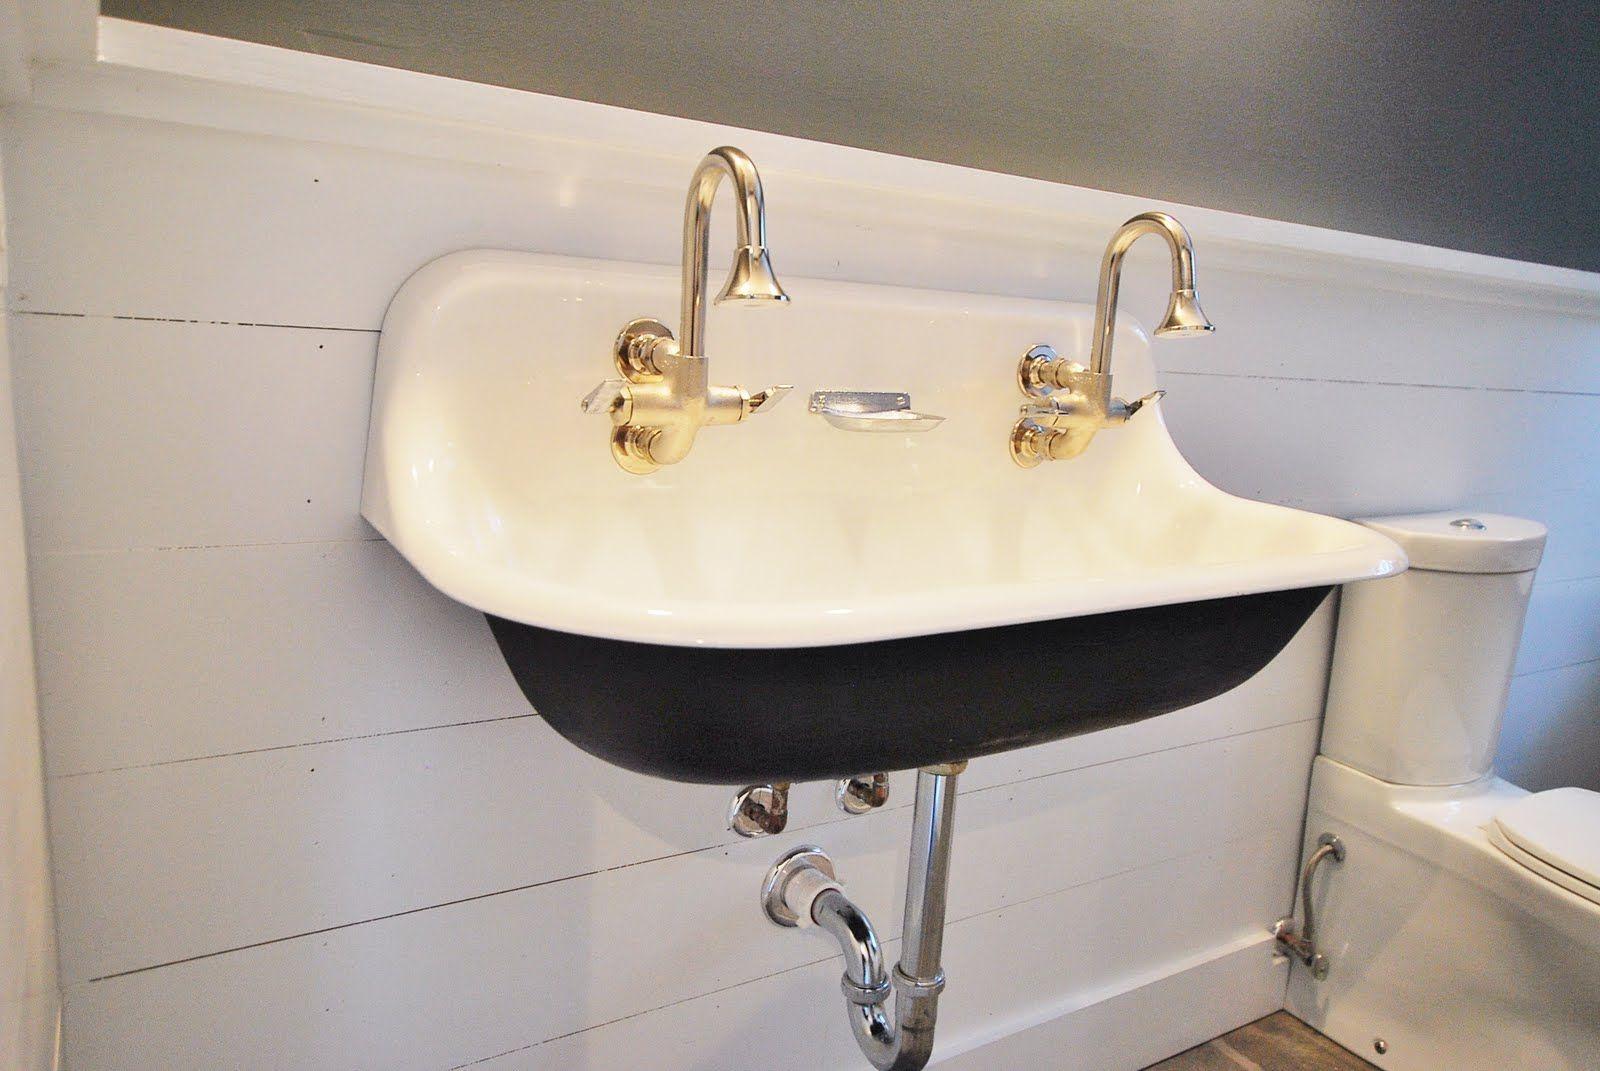 Wall Mounted Trough Sinks For Bathrooms Vintage Bathroom Sinks